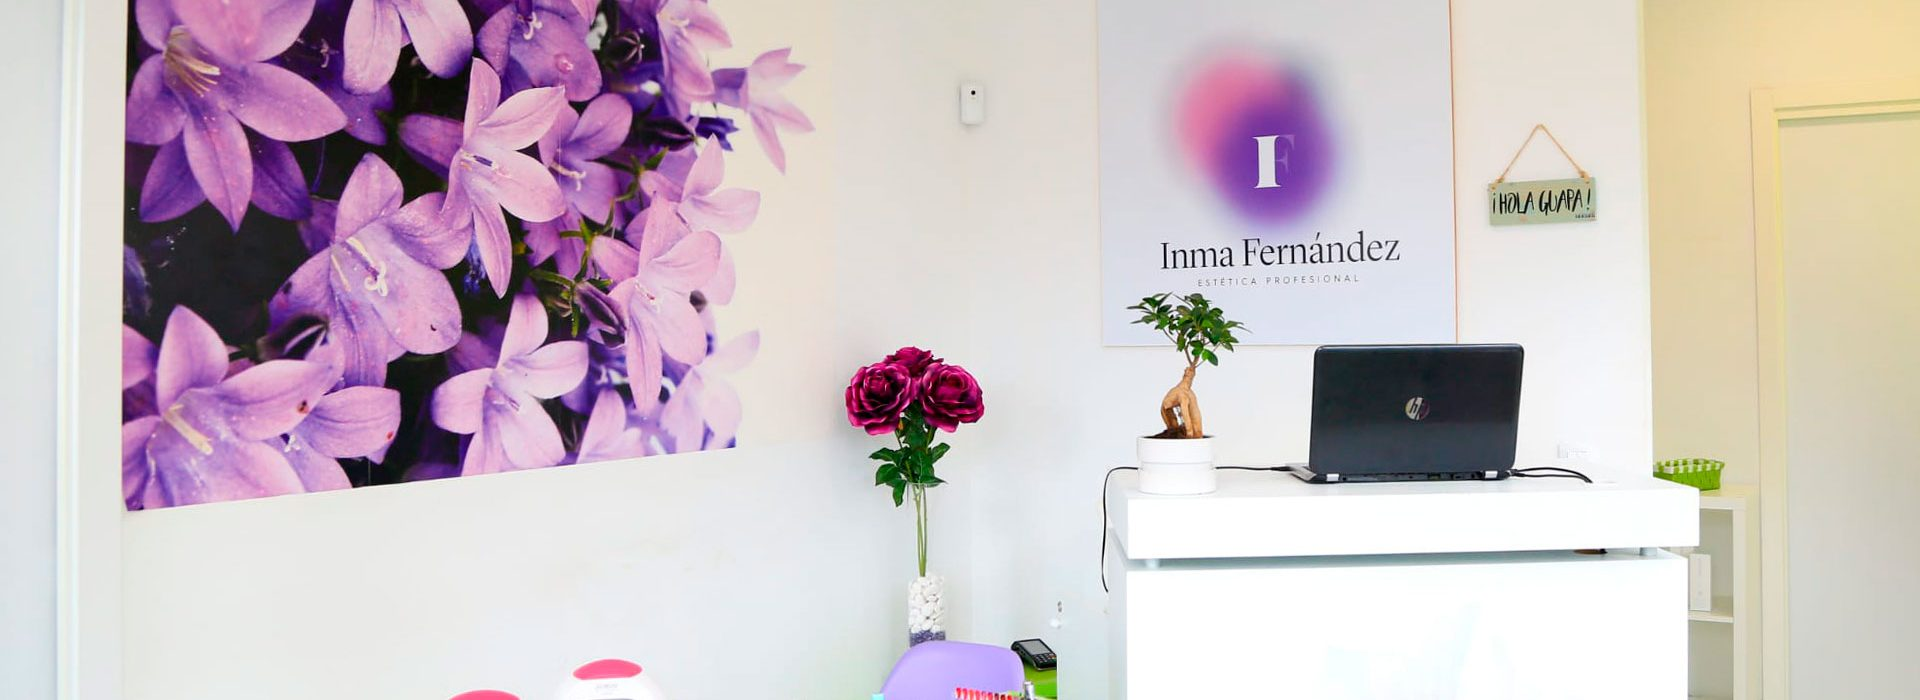 inma-fernandez-banner-02